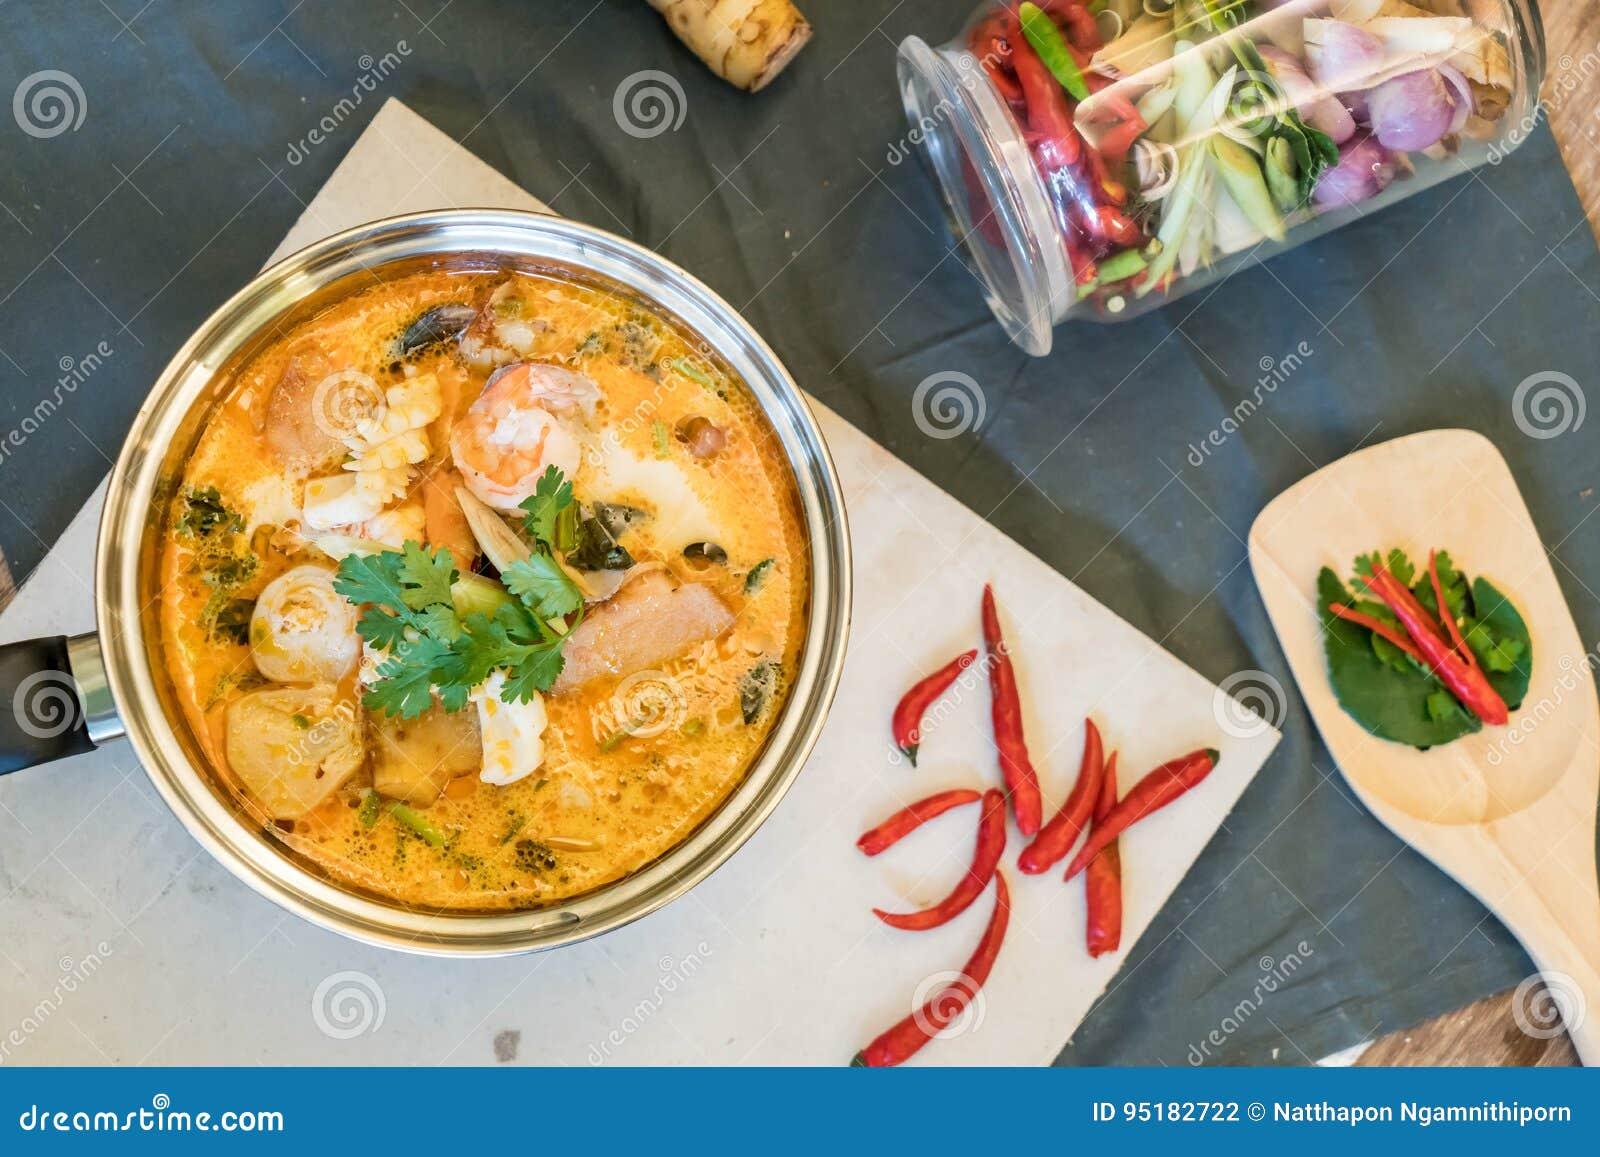 Minestra o Tom Yum Seafood acida dei frutti di mare